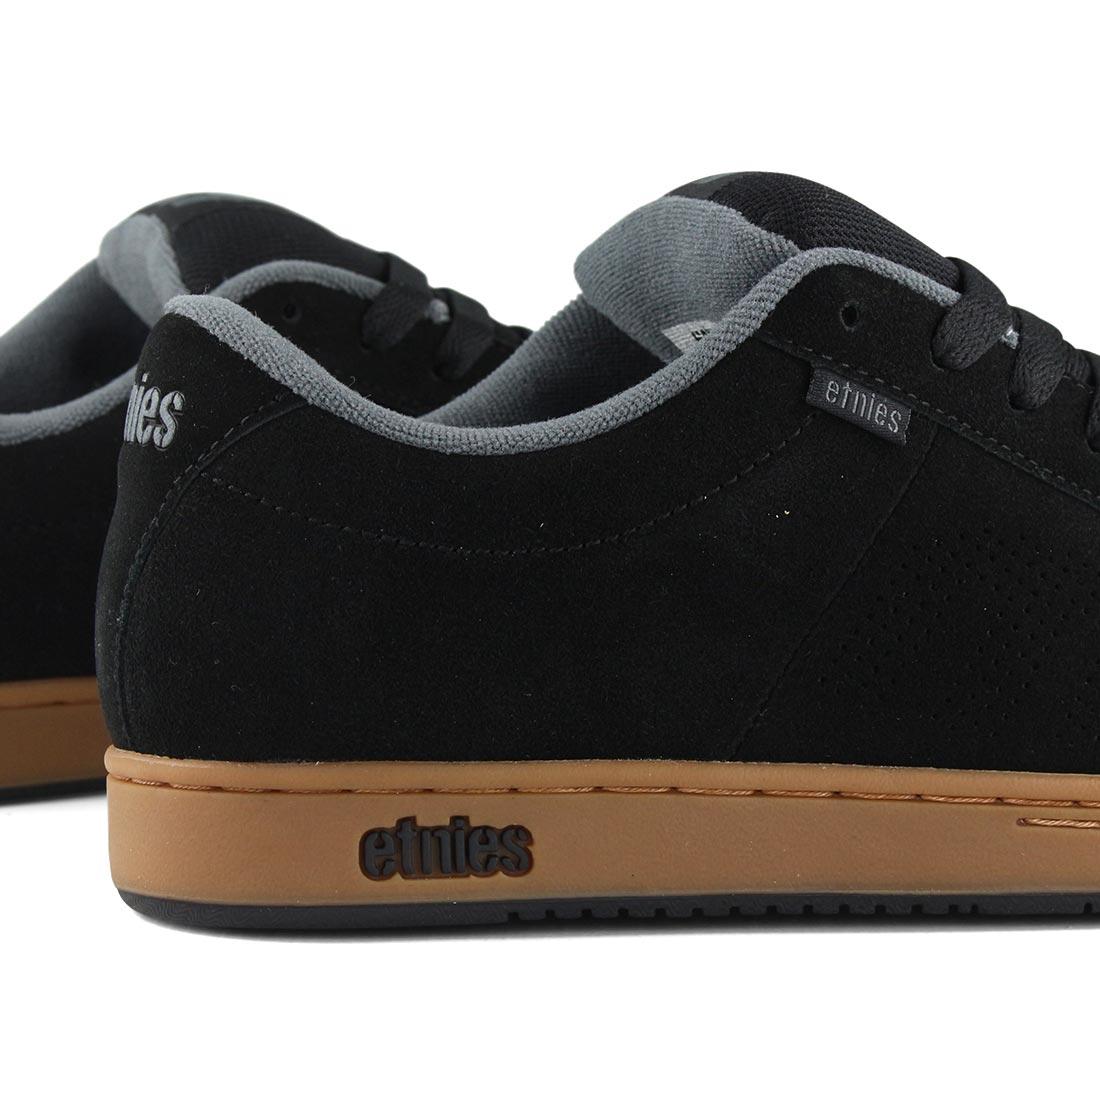 c11e7d2ed8b7 Etnies Kingpin Shoes - Black   Gum   Dark Grey